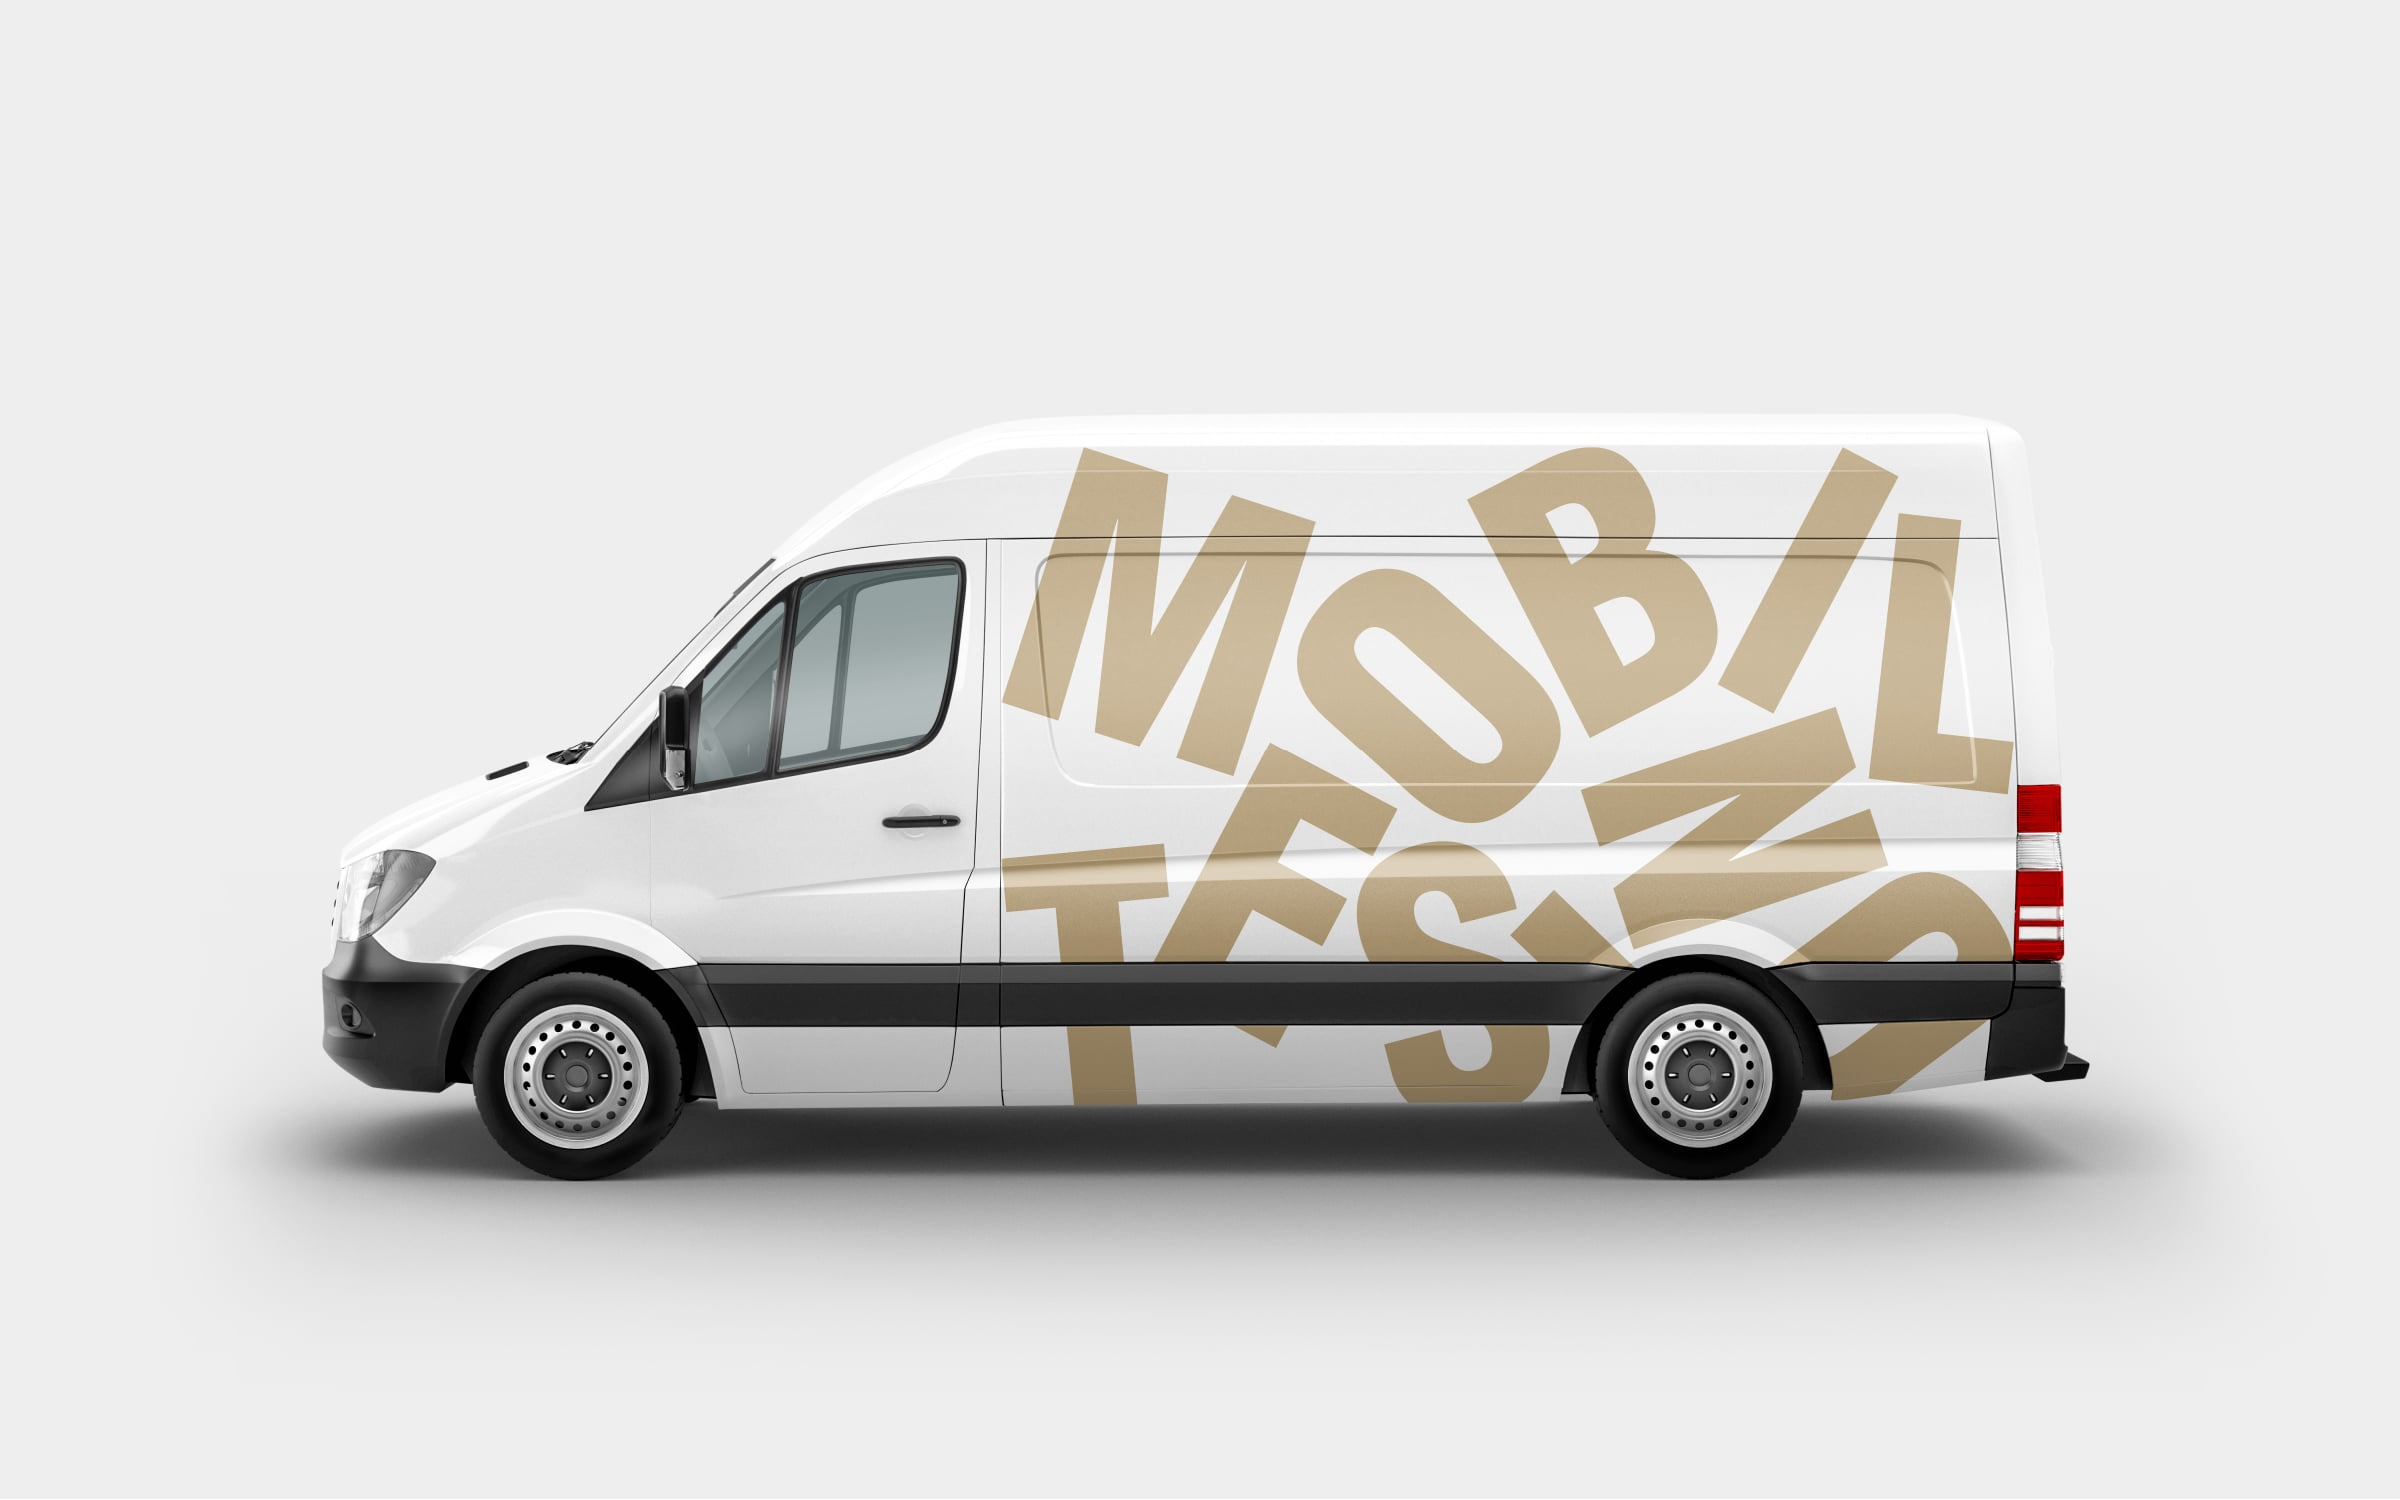 Mobiltesino Brand Design And Art Direction